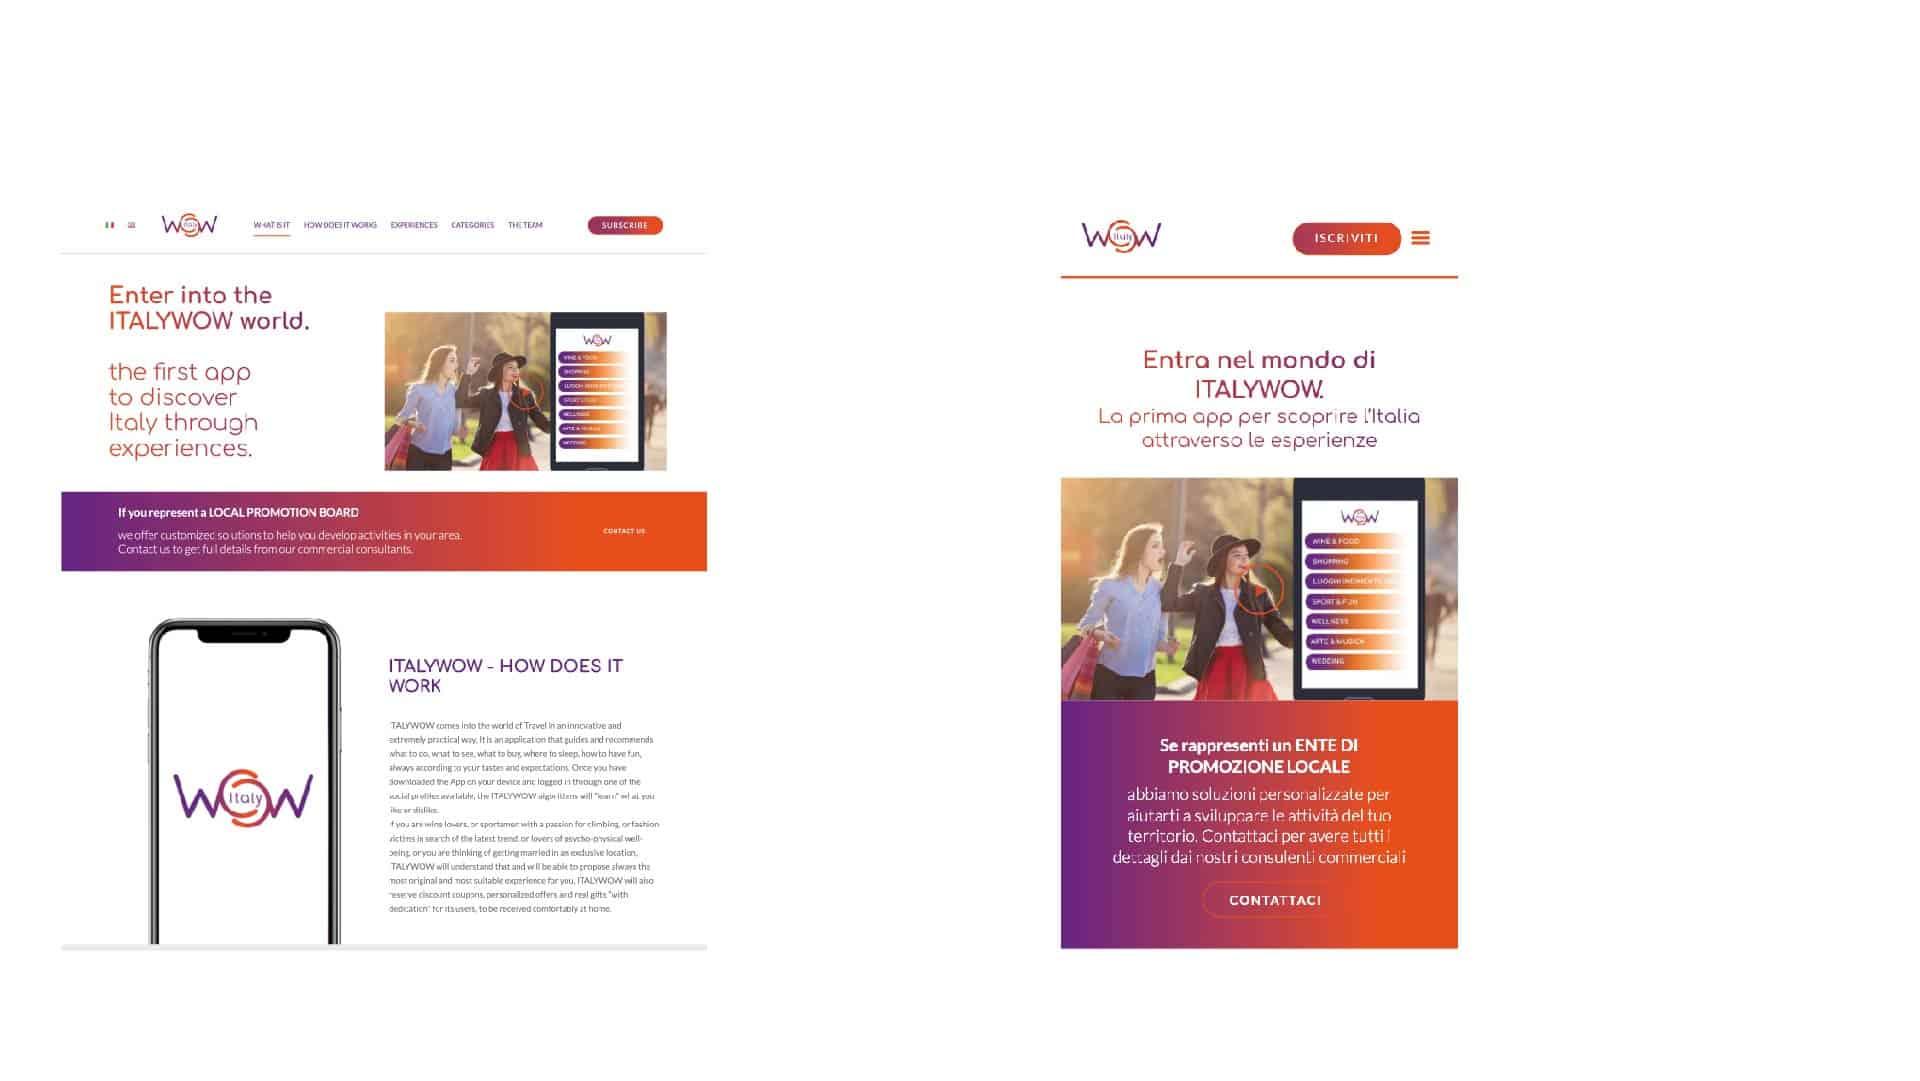 Diego Fabi - Portfolio - diego fabi portfolio webdesign italywow homepage -